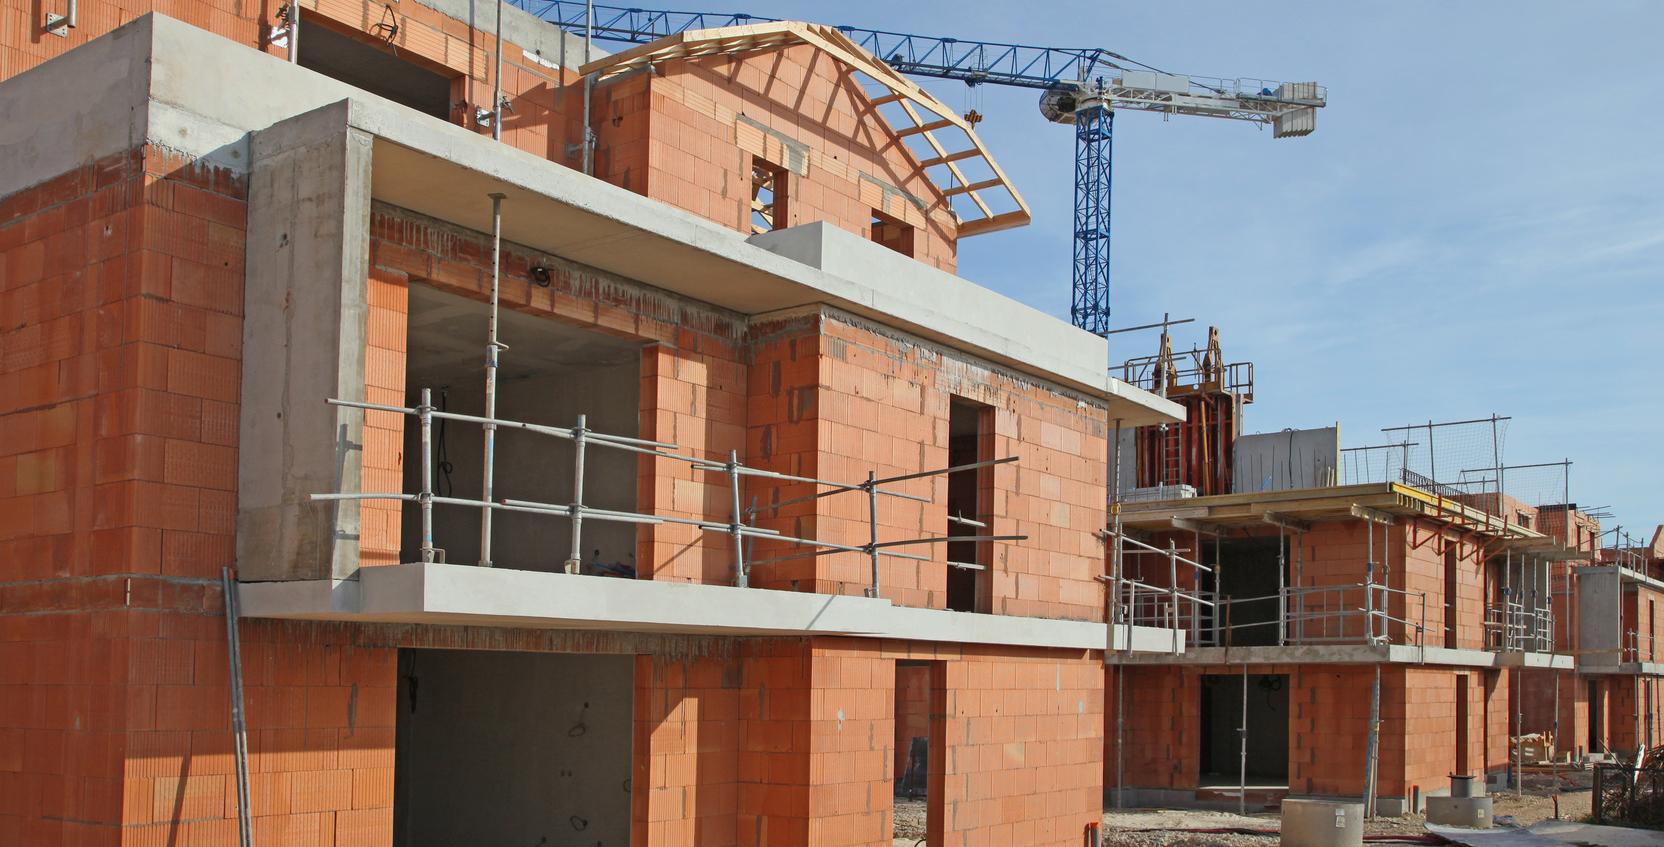 Lavori edili Montescudo Rimini